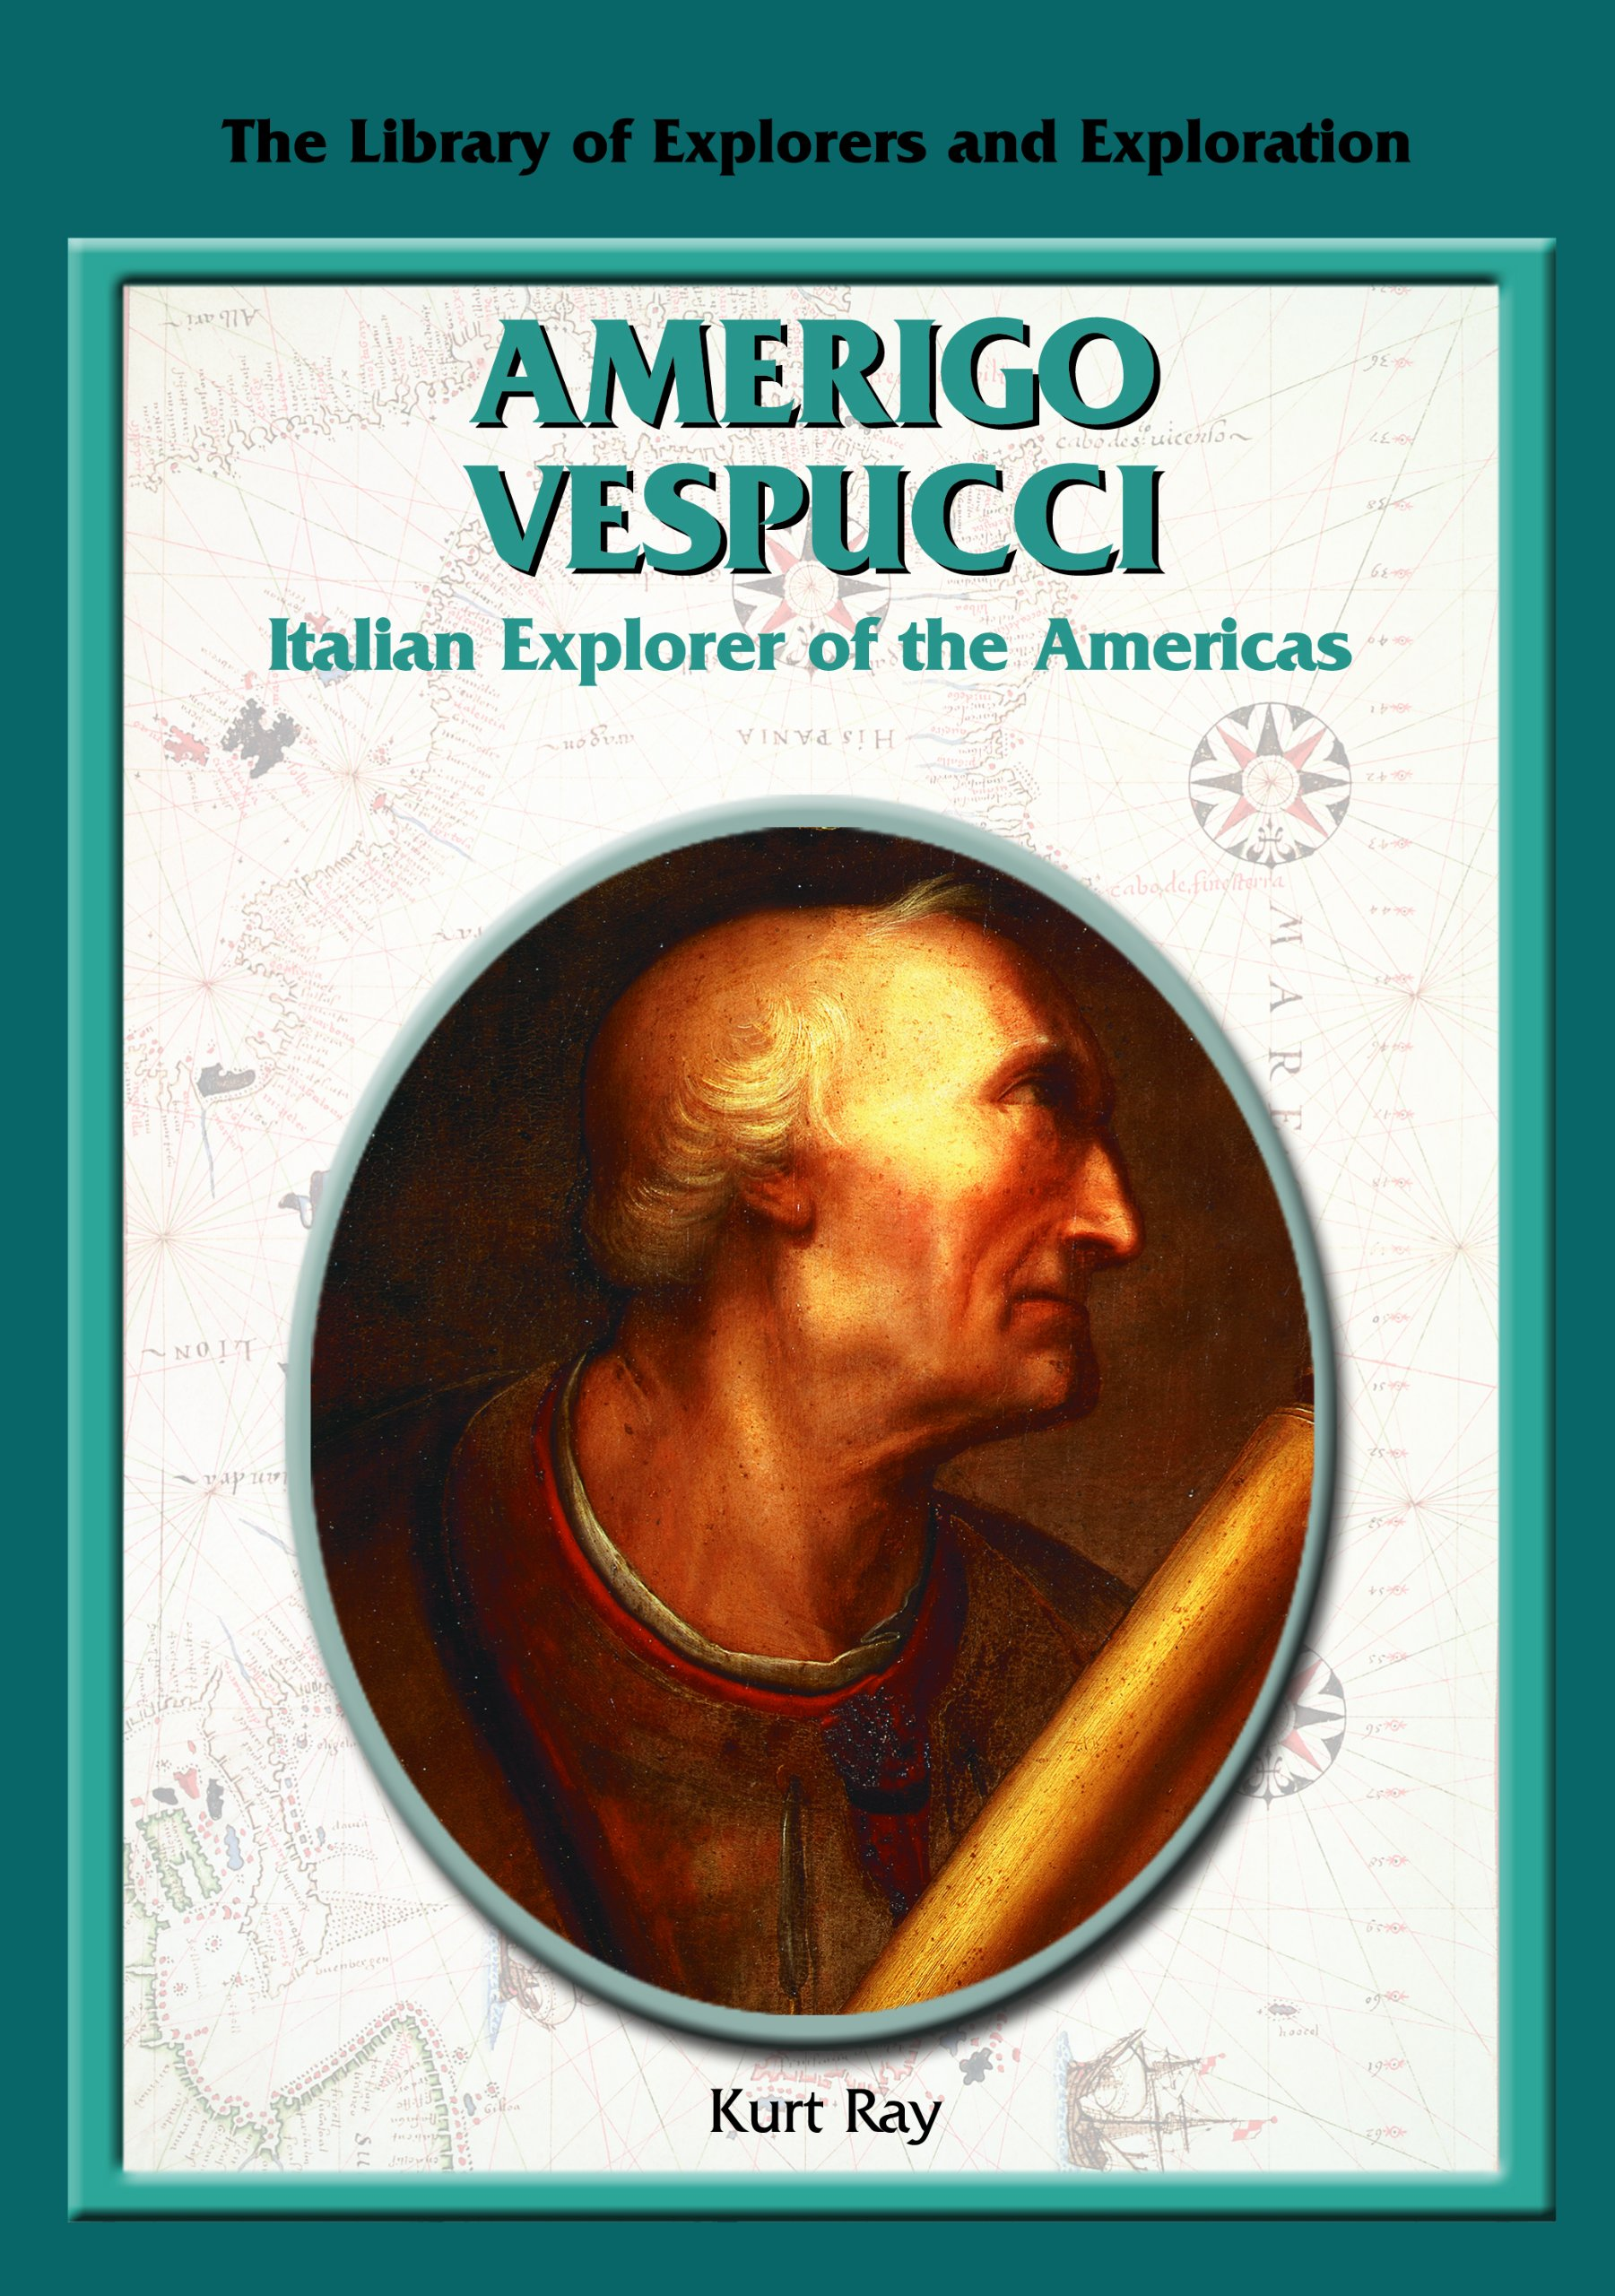 Amerigo Vespucci: Italian Explorer of the Americas (Library of Explorers and Exploration)